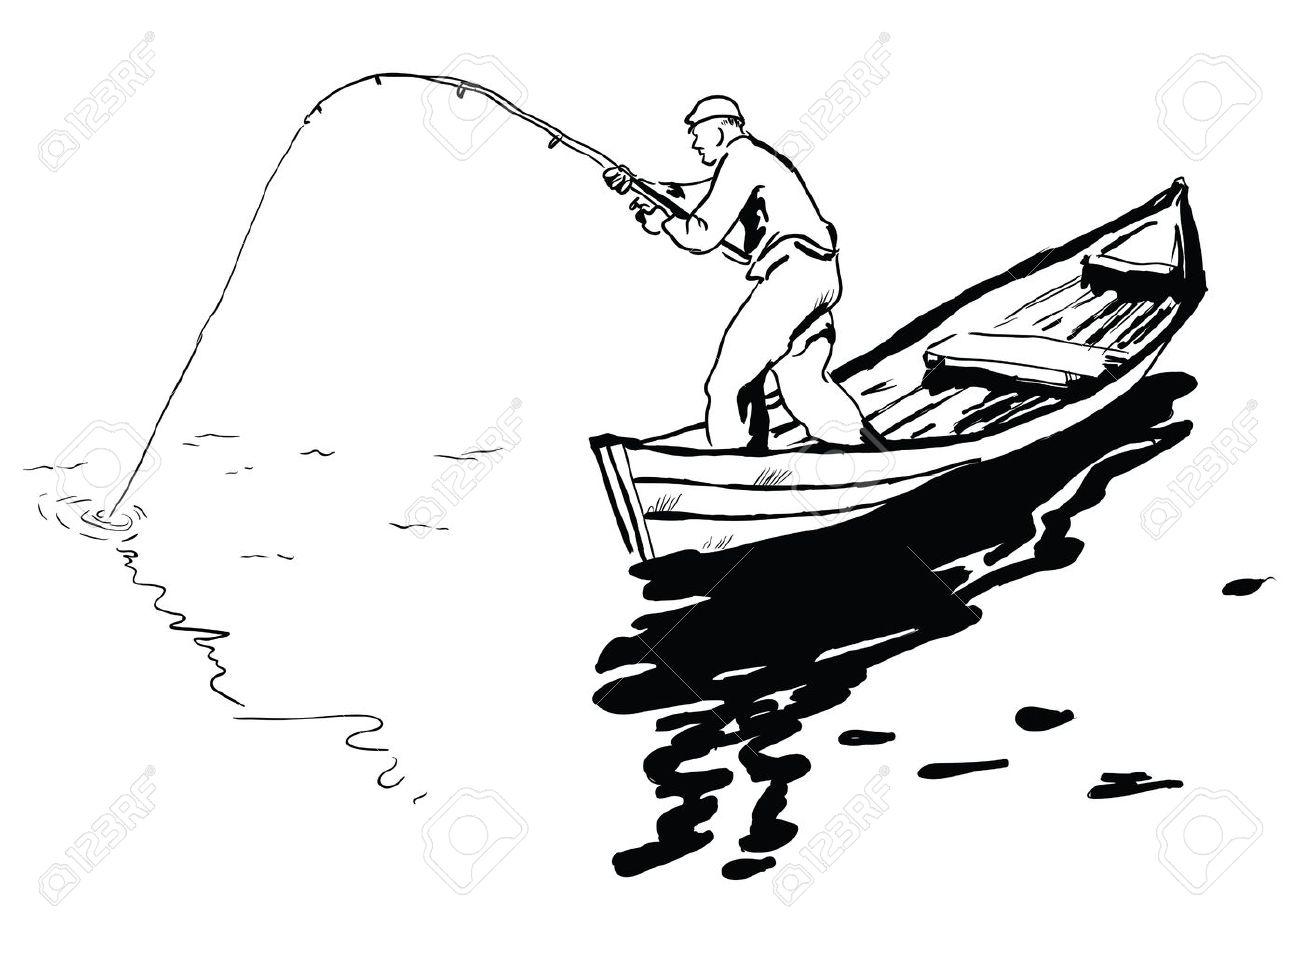 Un Pescador En Un Barco De Pesca Carrete Que Hace Girar. Ilustración ...